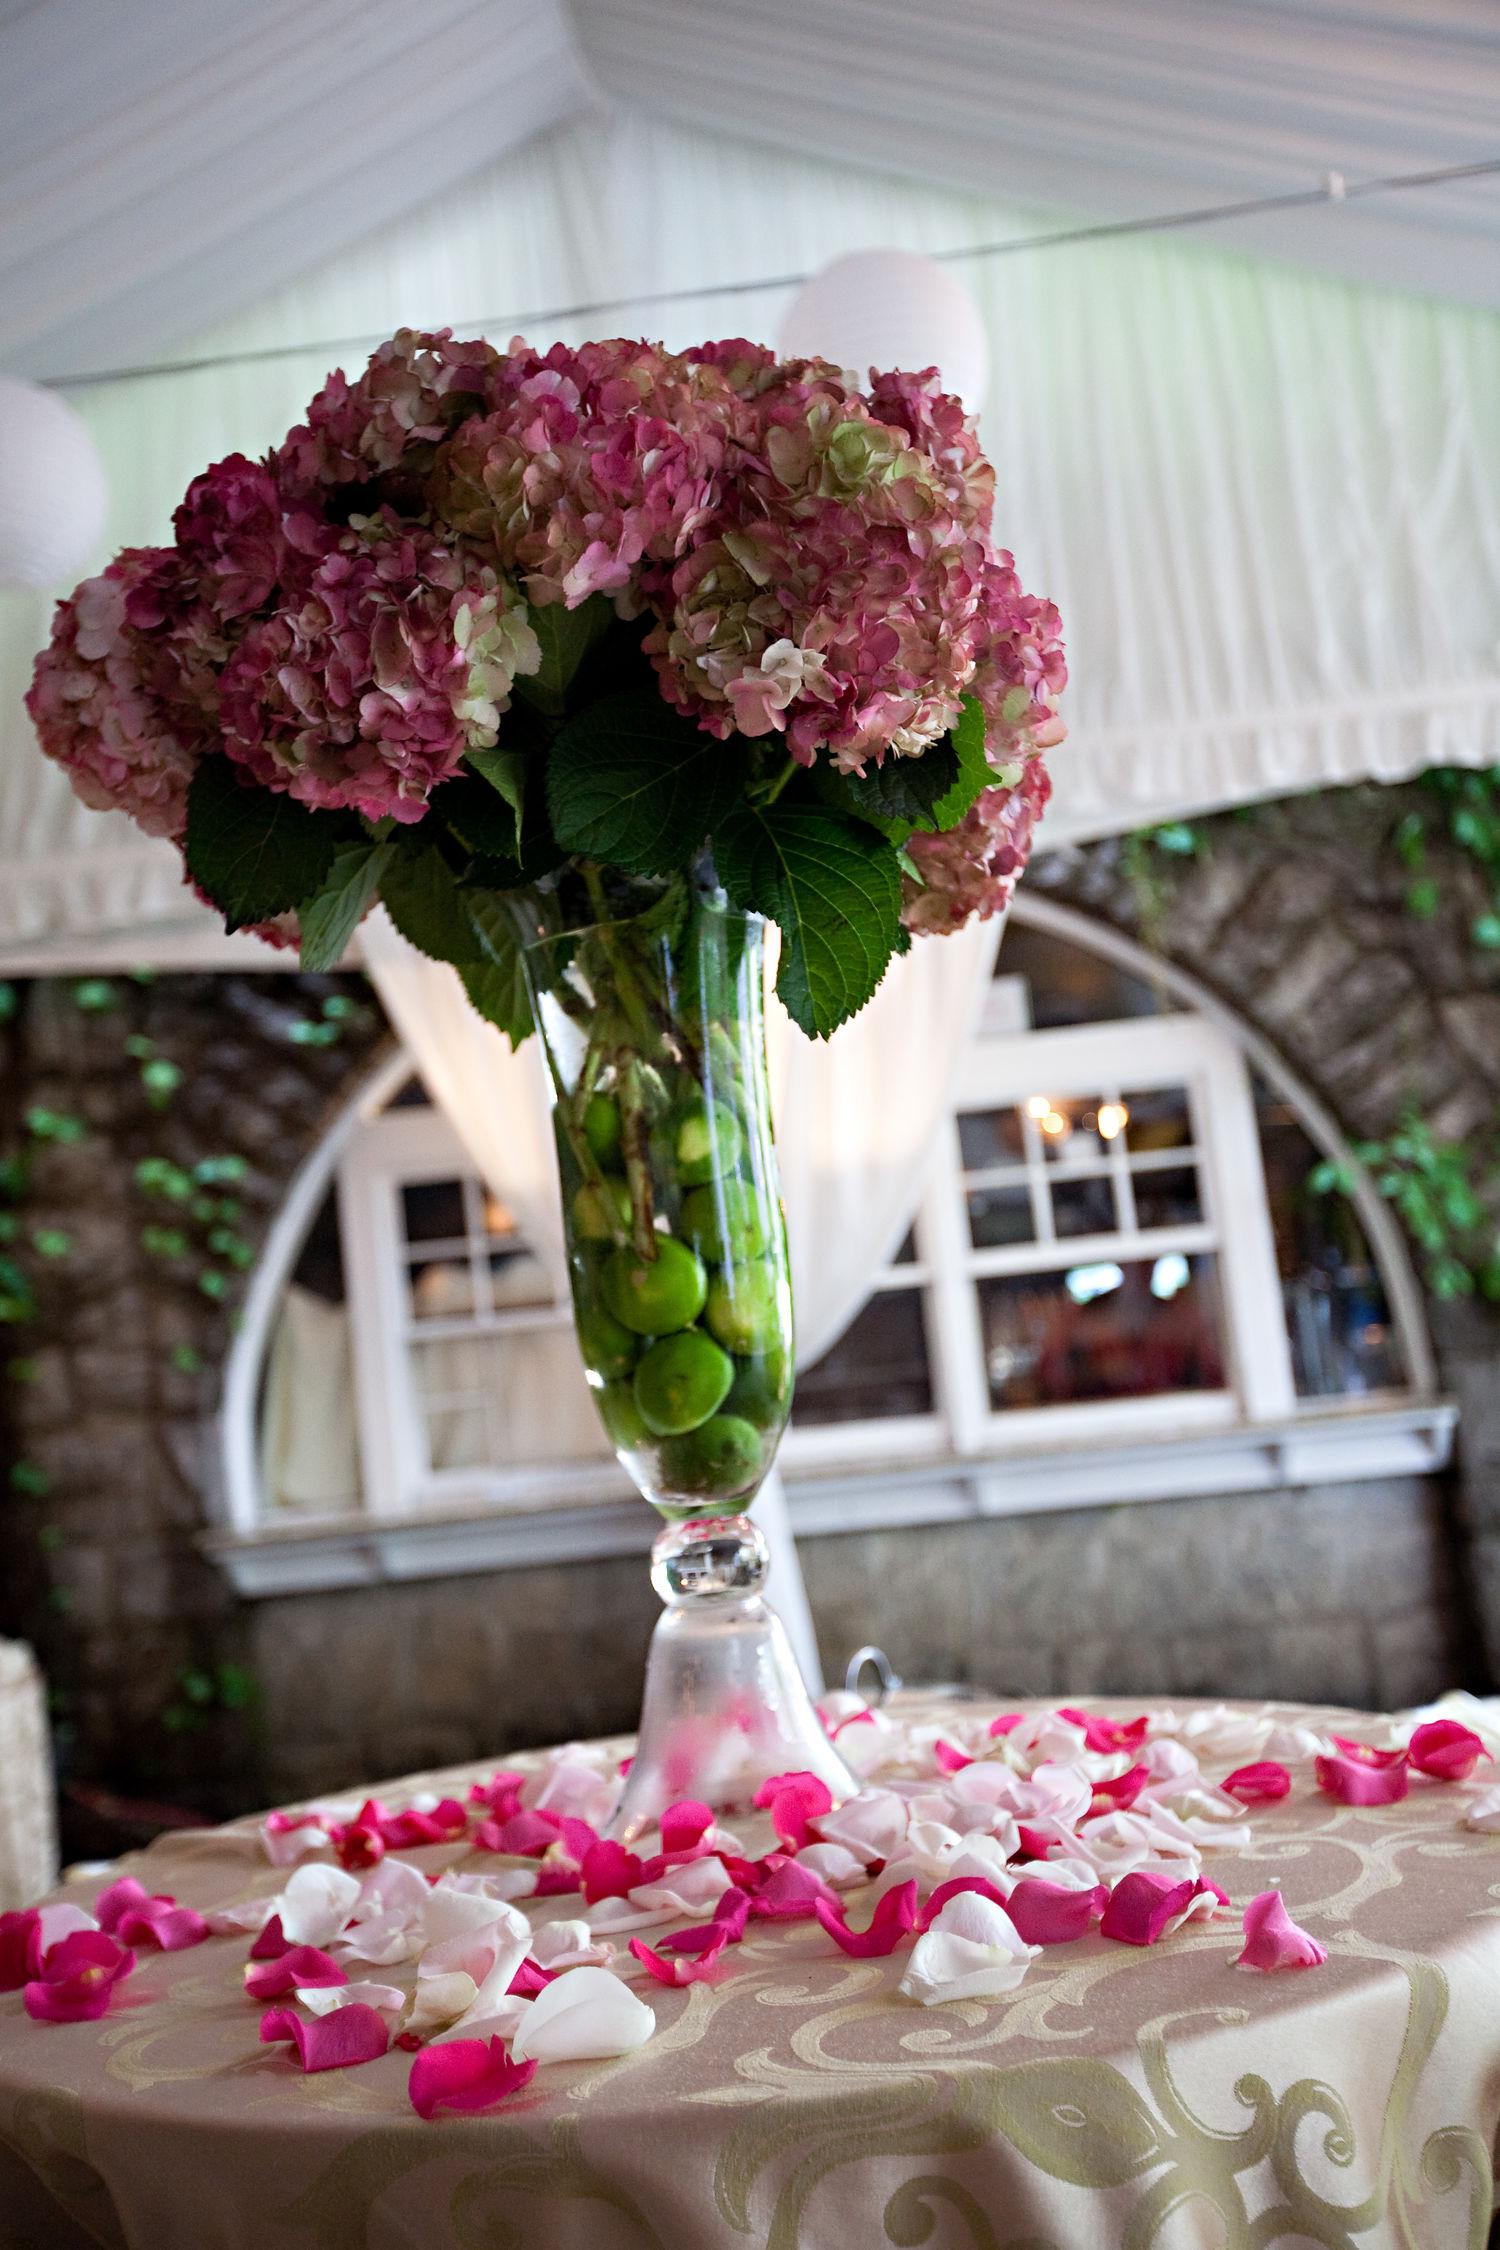 Wedding reception flowers centerpieces decorations carithers wedding reception flowers centerpieces decorations carithers florist atlanta mightylinksfo